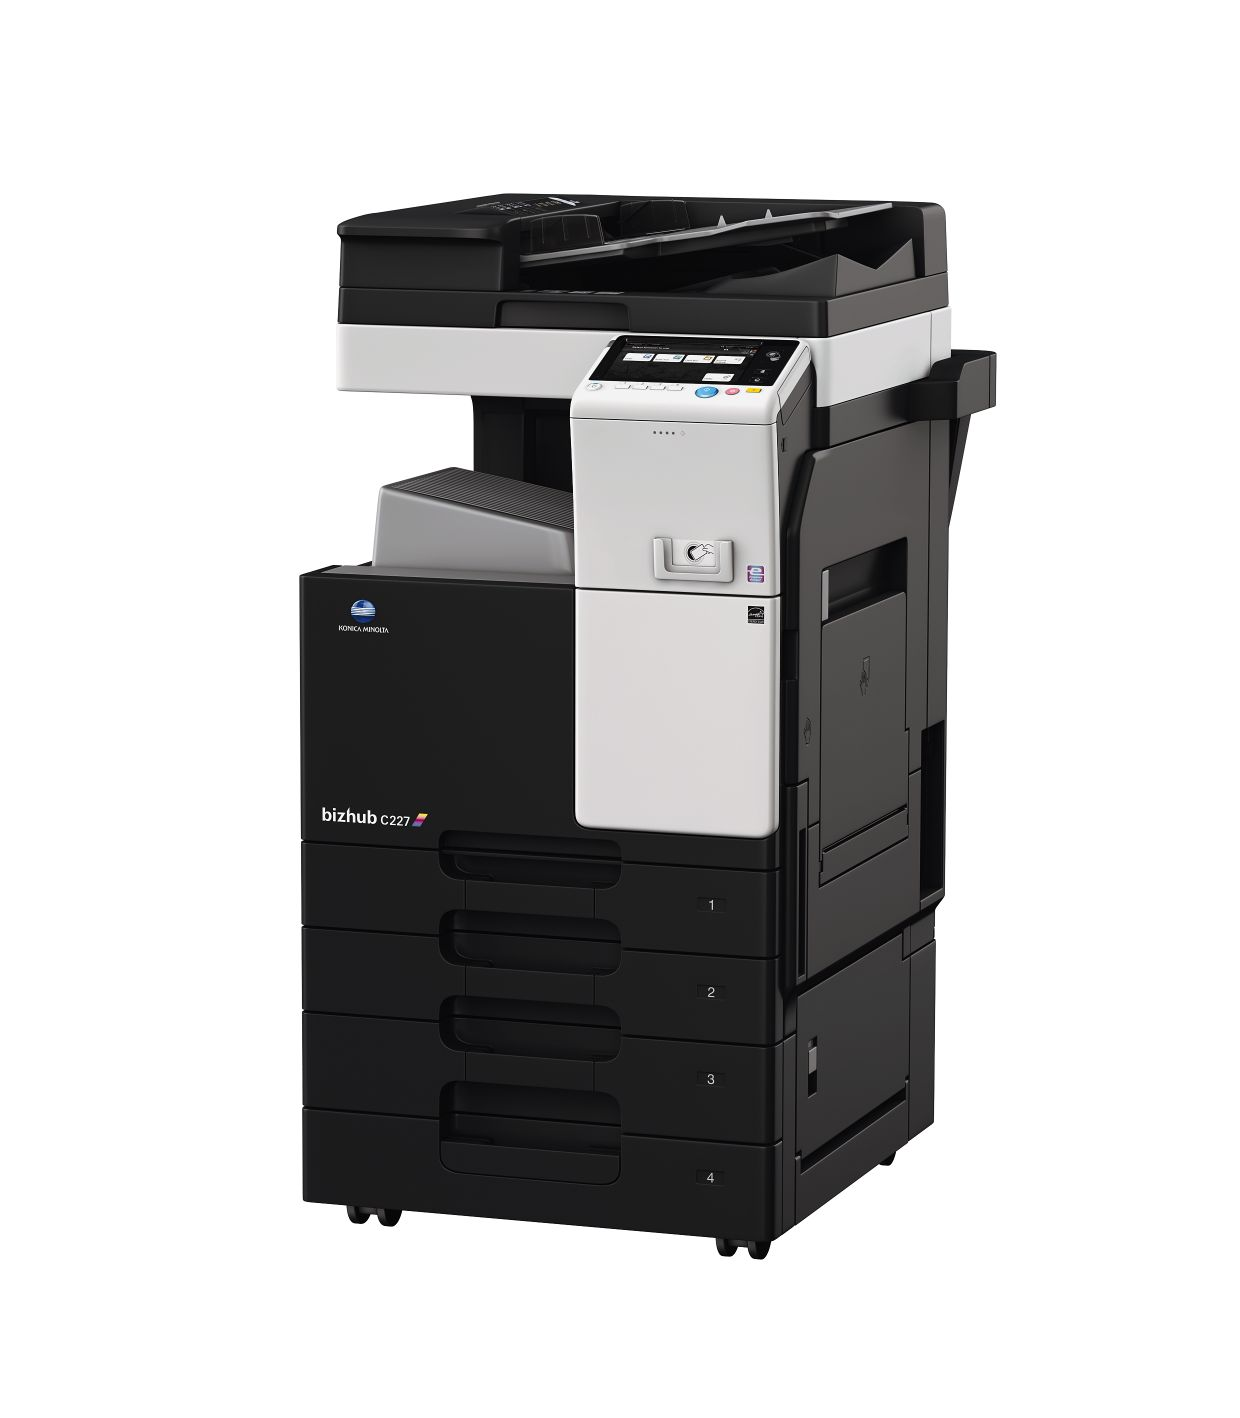 bizhub c227 color multifunction copier purchase or lease;Gulf Office  Technologies Sarasota Manatee St.